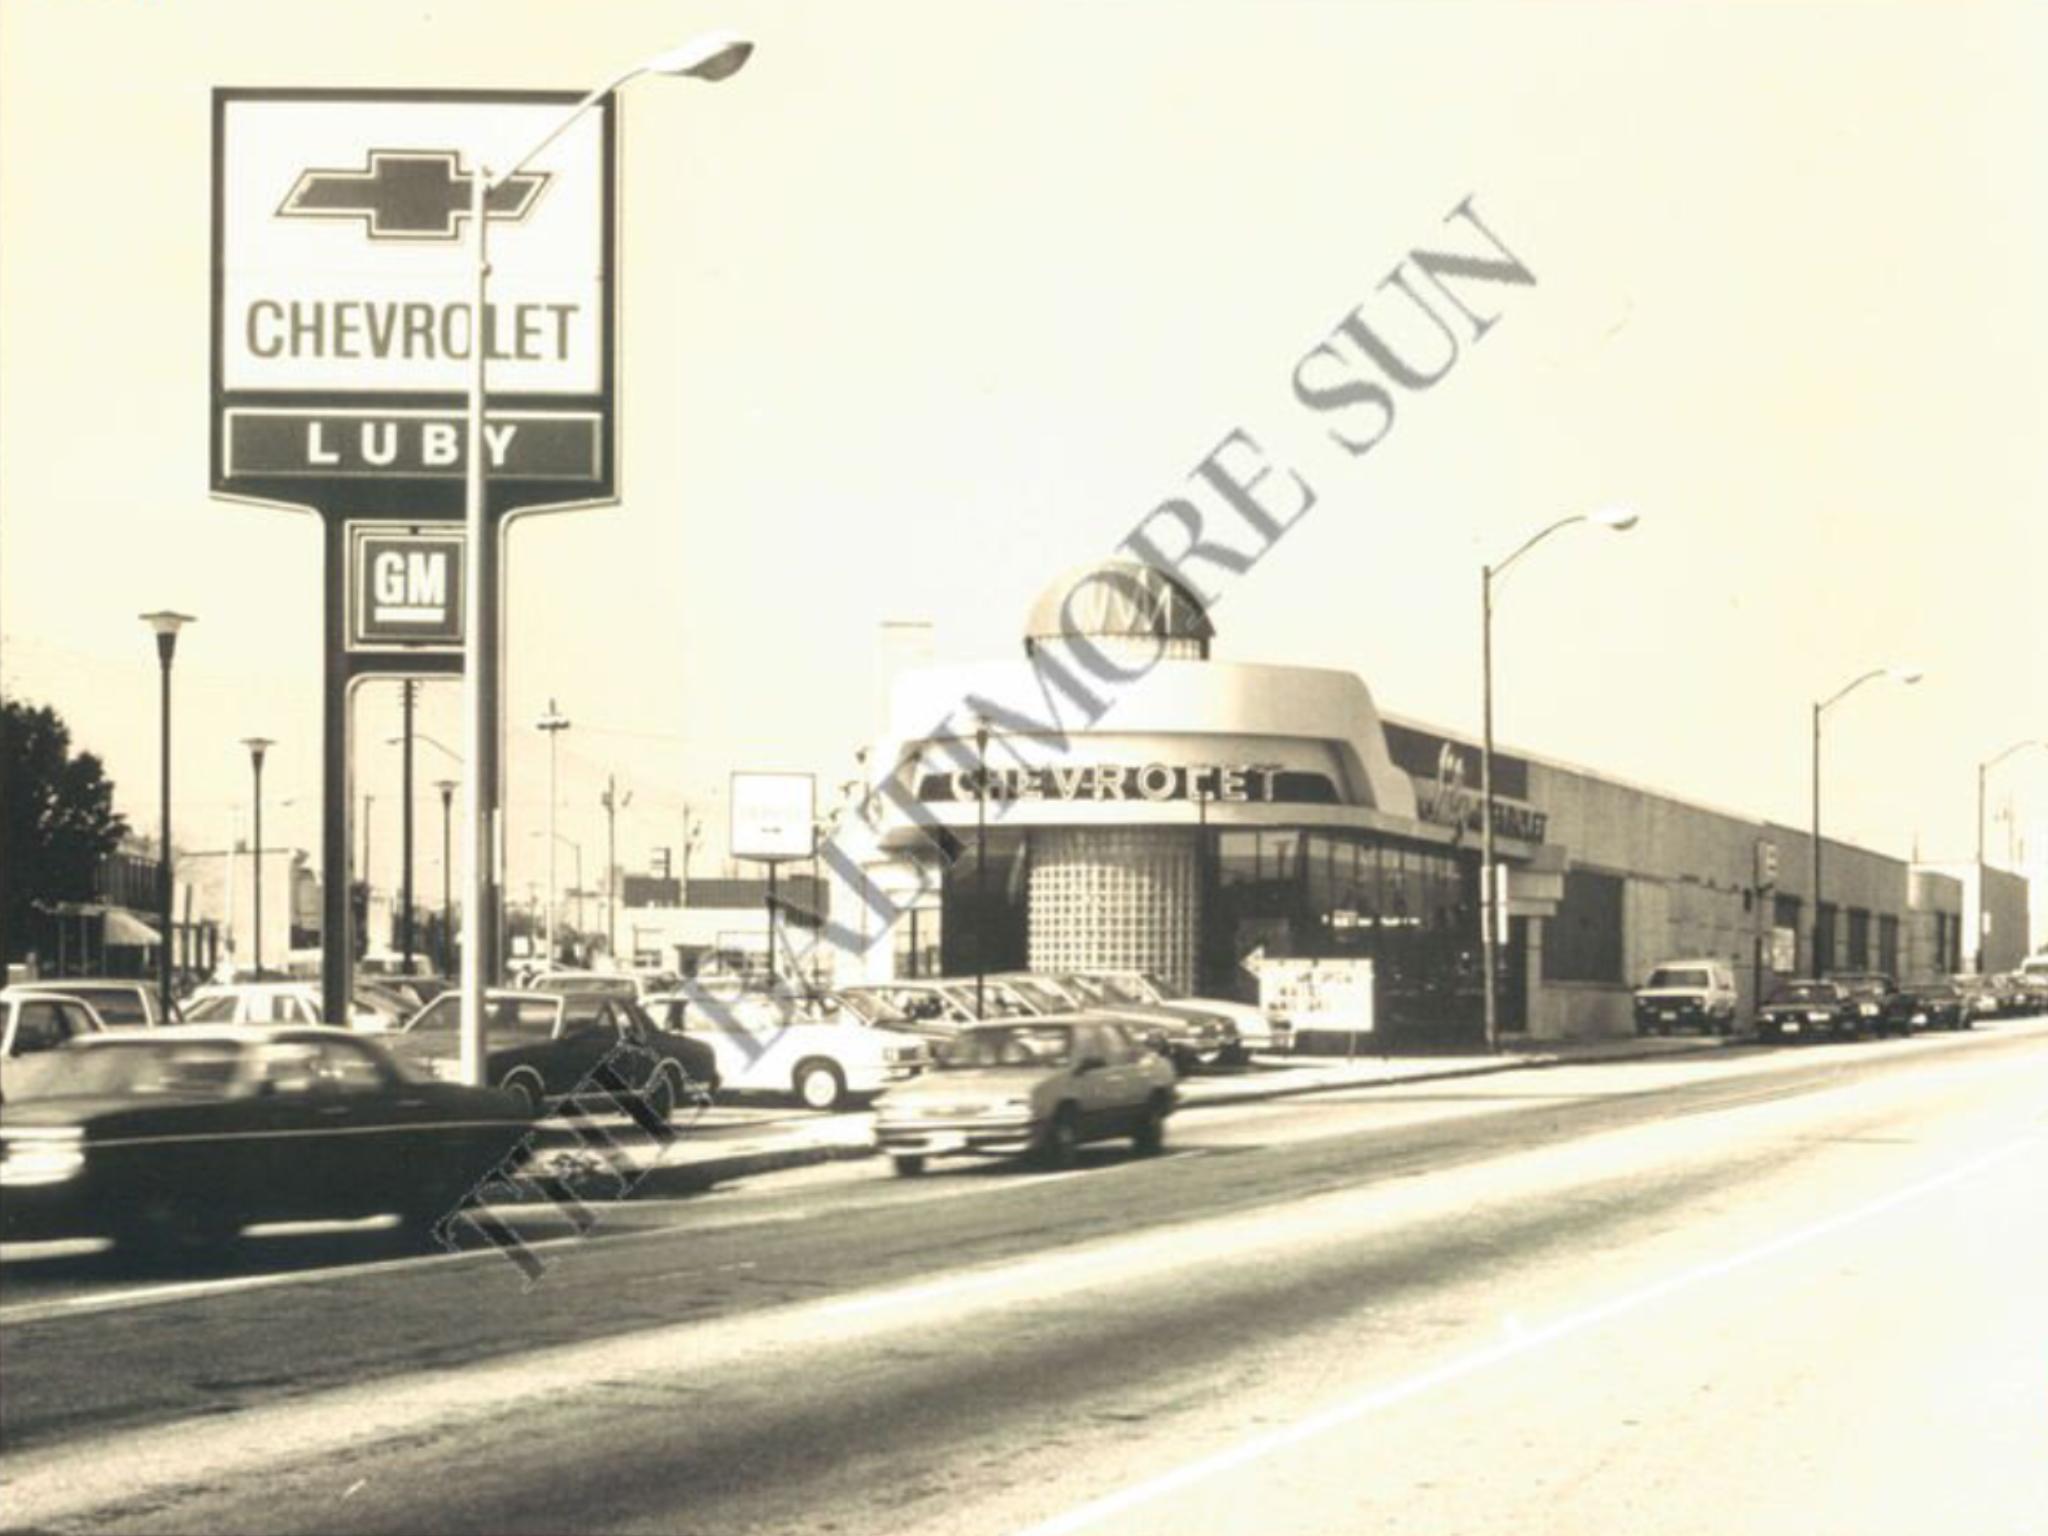 Luby Chevrolet Dealership Baltimore Maryland Chevrolet Dealership Chevrolet Car Dealership